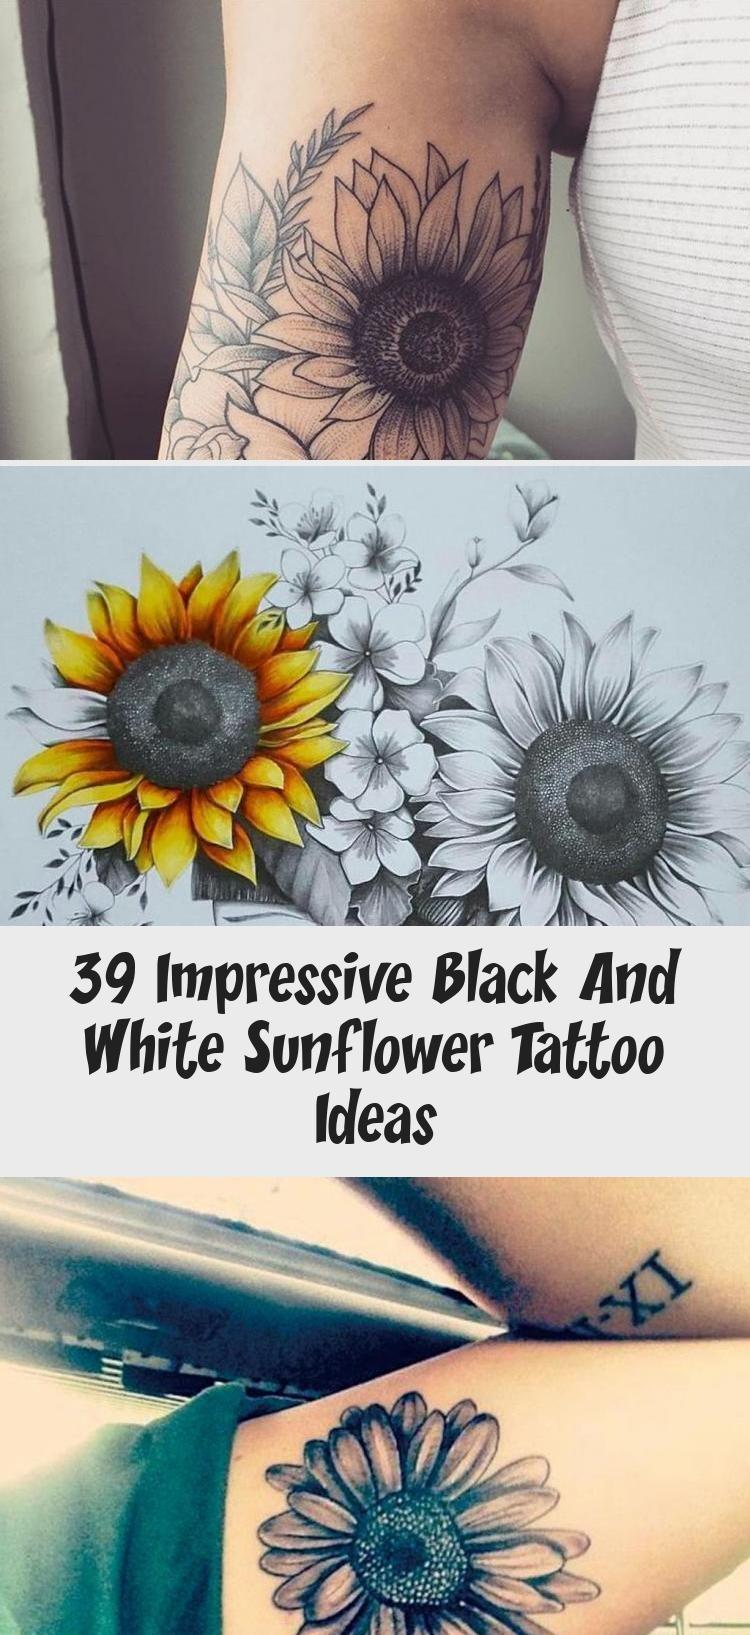 Photo of 39 Impressive Black And White Sunflower Tattoo Ideas – Tattoo   Bineyy.Com